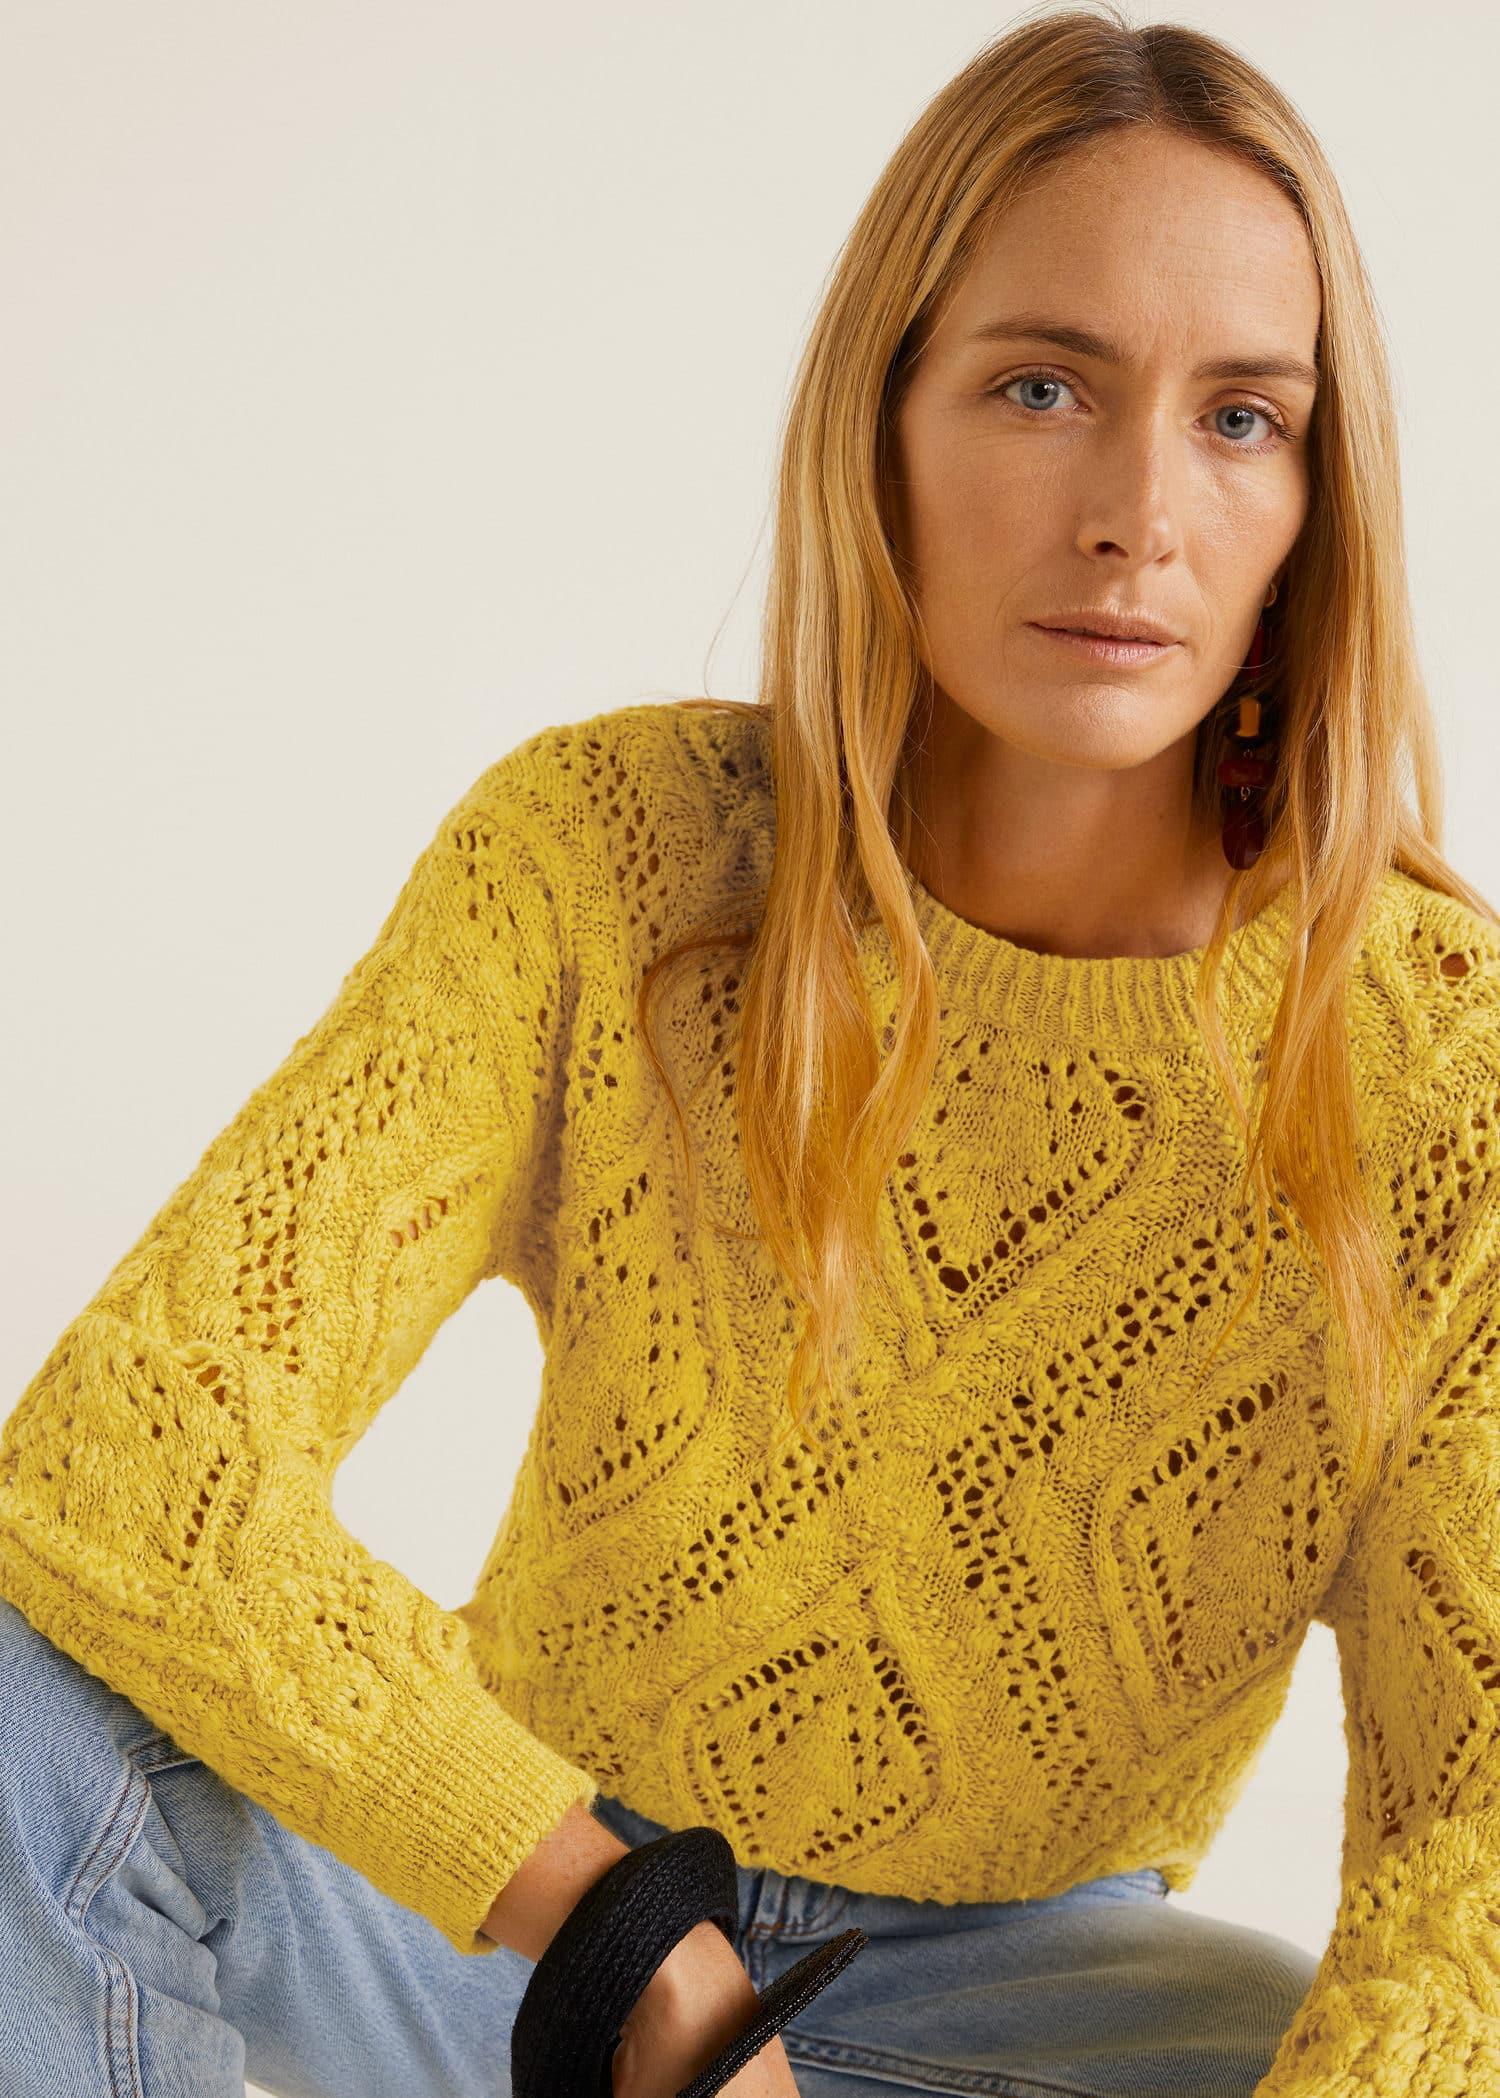 Genombruten stickad tröja Damer | Mango Sverige